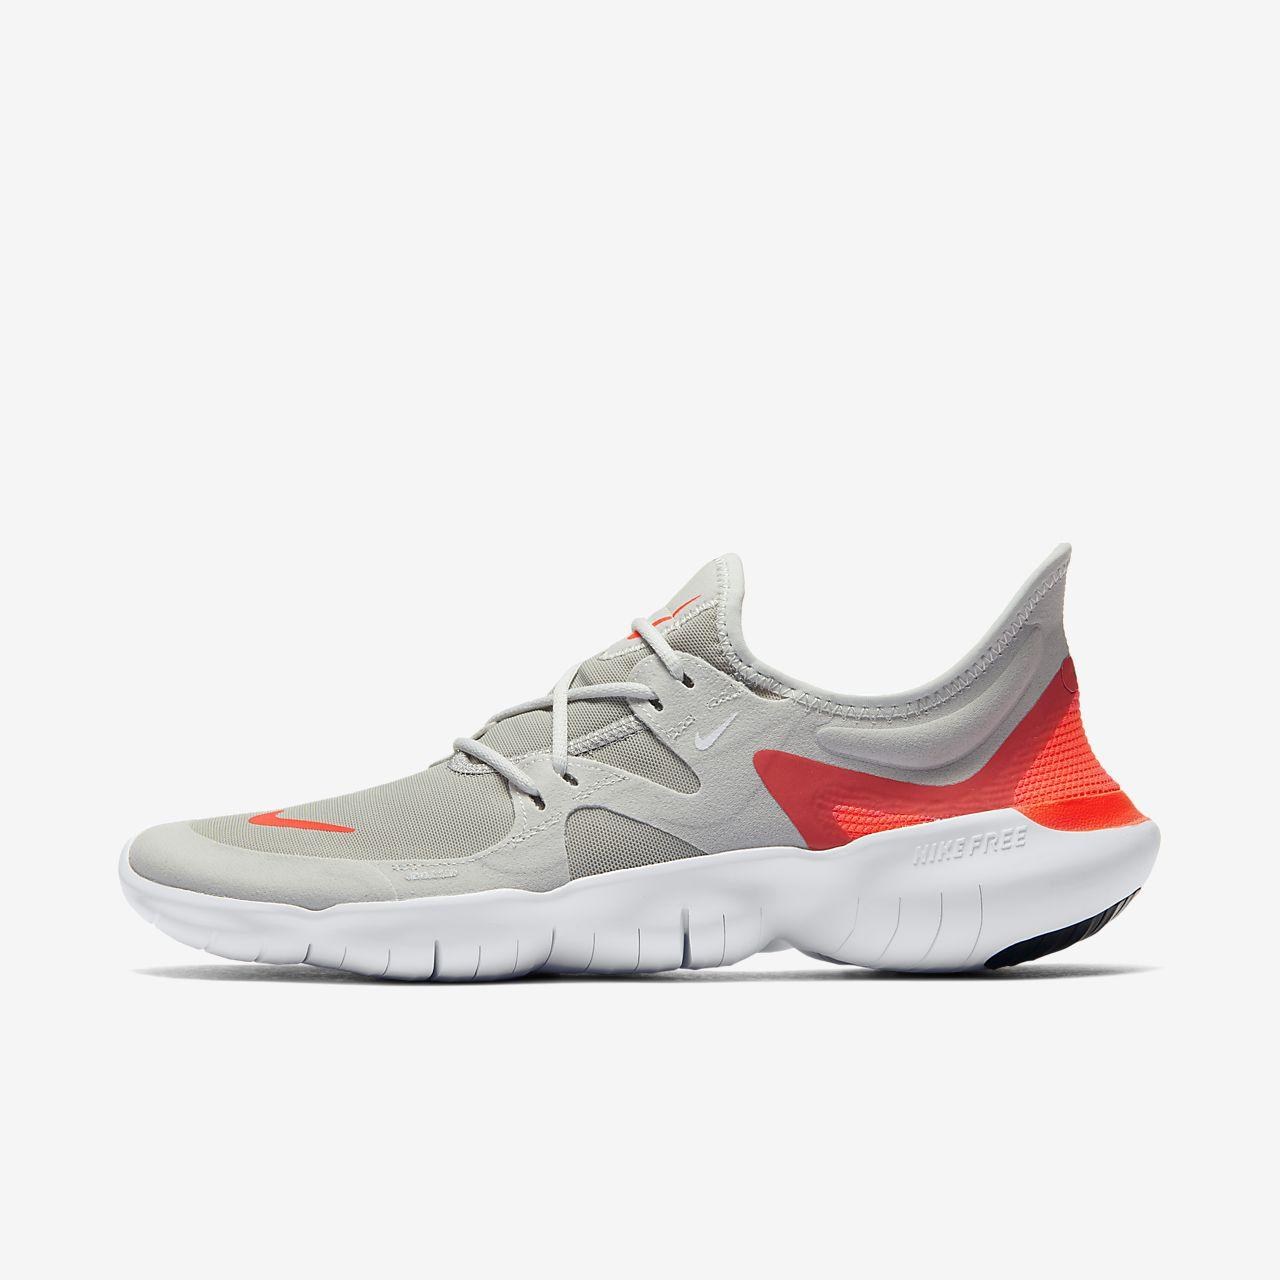 Nike Free 5.0 Flyknit NIKE Official]Nike Free RN 5.0 Men's Running Shoe.Online store ...